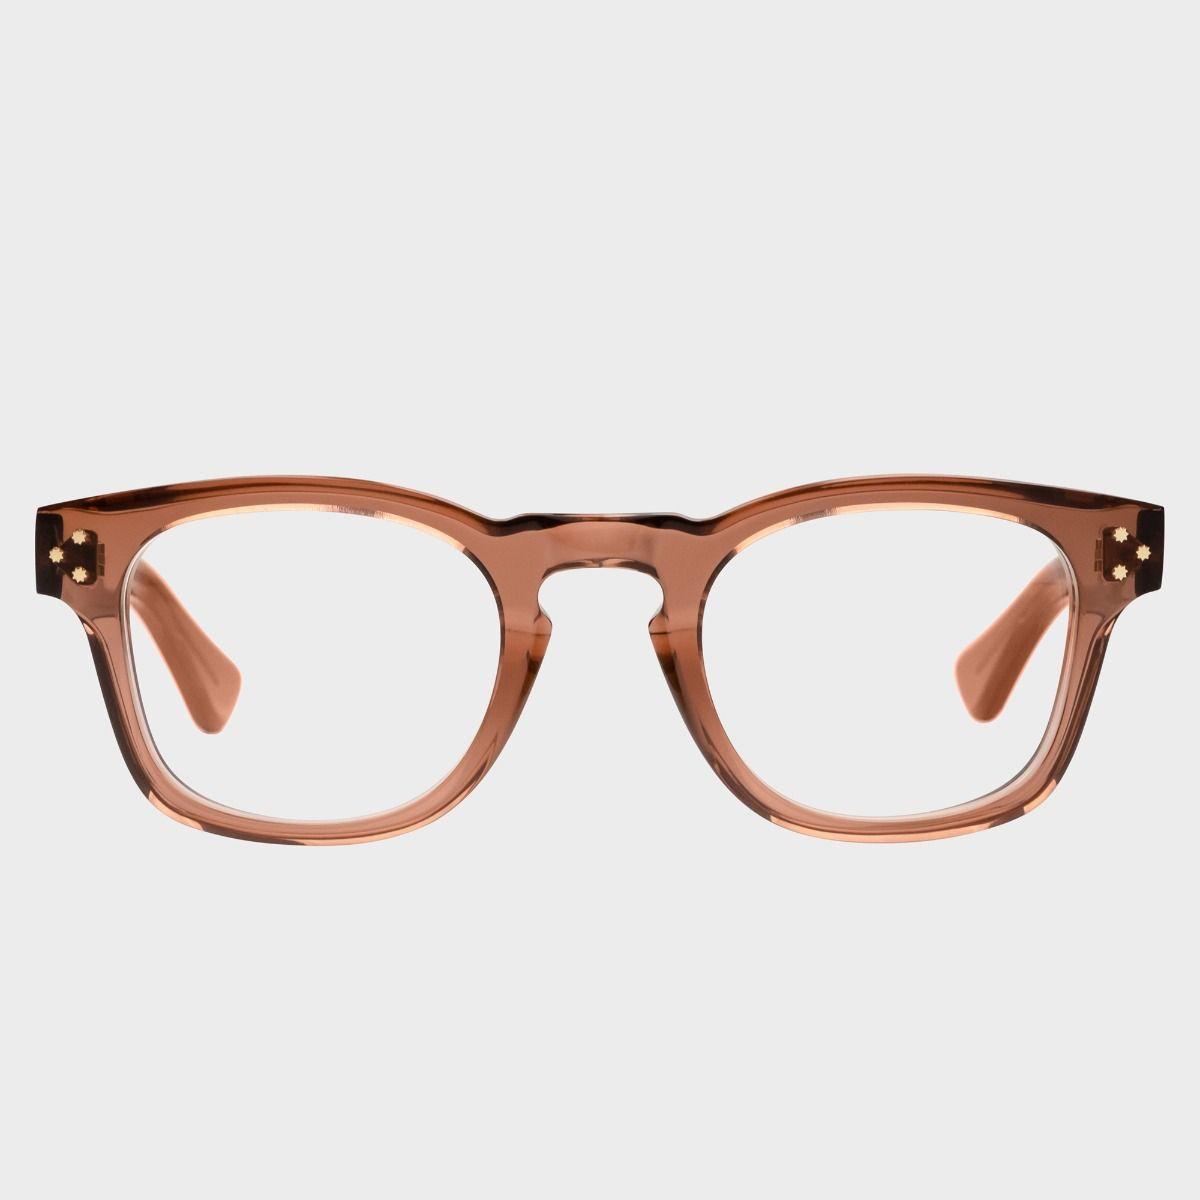 1389 Optical Square Glasses